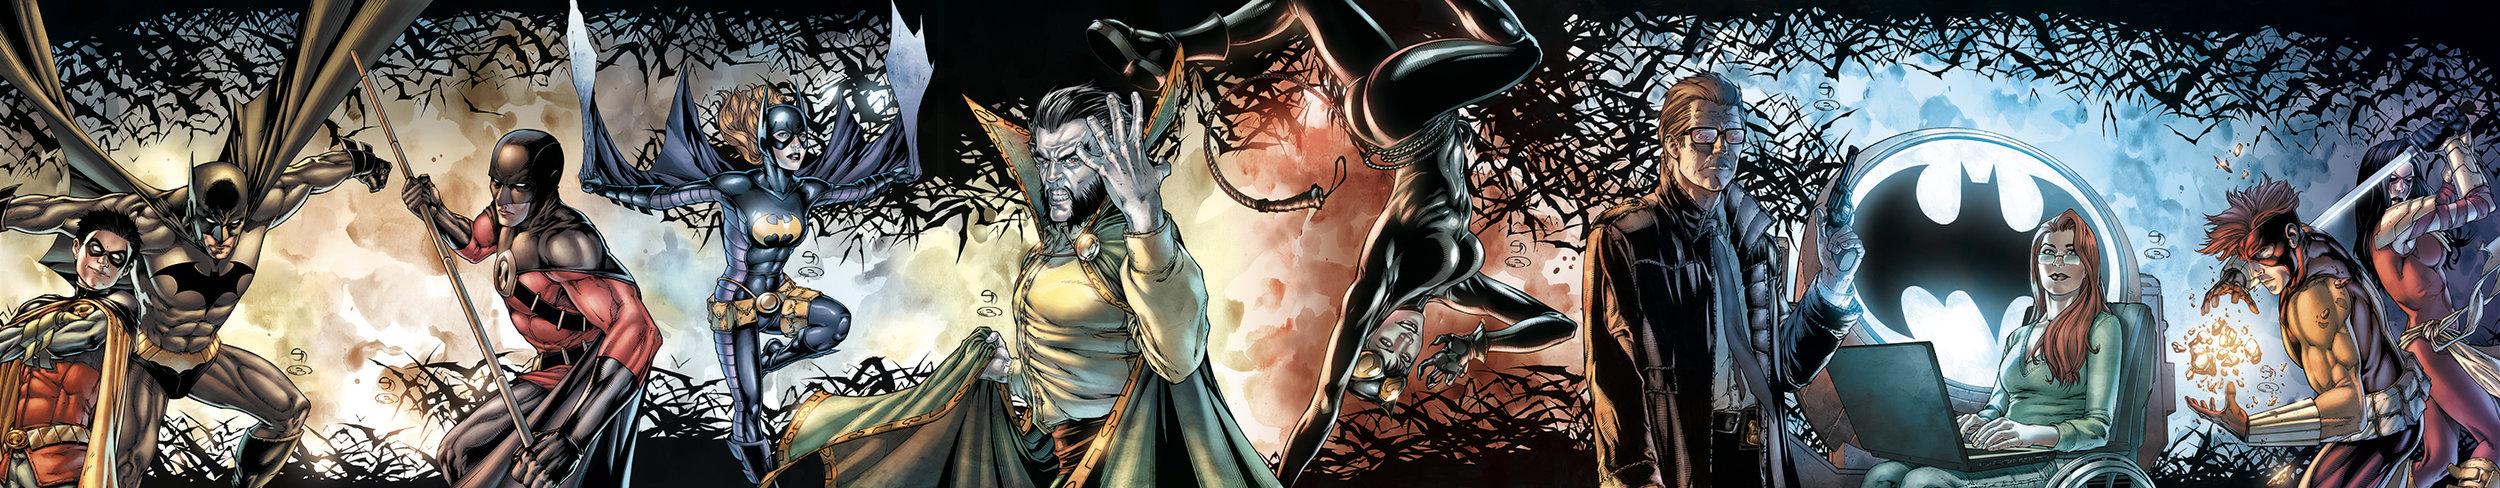 "Covers  ""Bruce Wayne: The Road Home""  Pencil and ink: Shane Davis  Colors: Barbara Ciardo  DC COMICS"